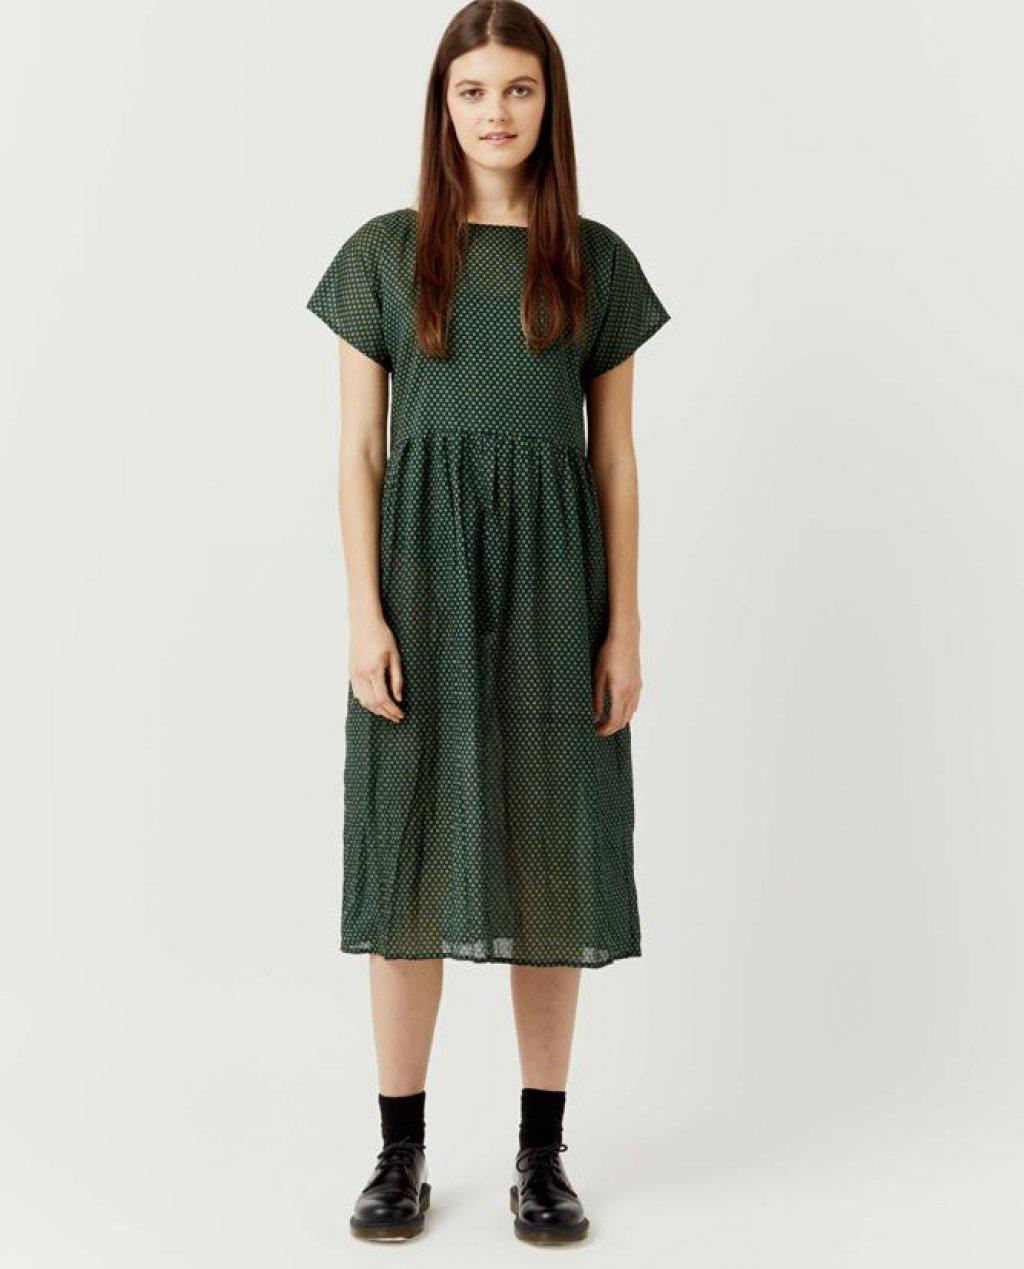 Widdess - Captain Dress - Leonard - Cotton - PRICE REDUCED